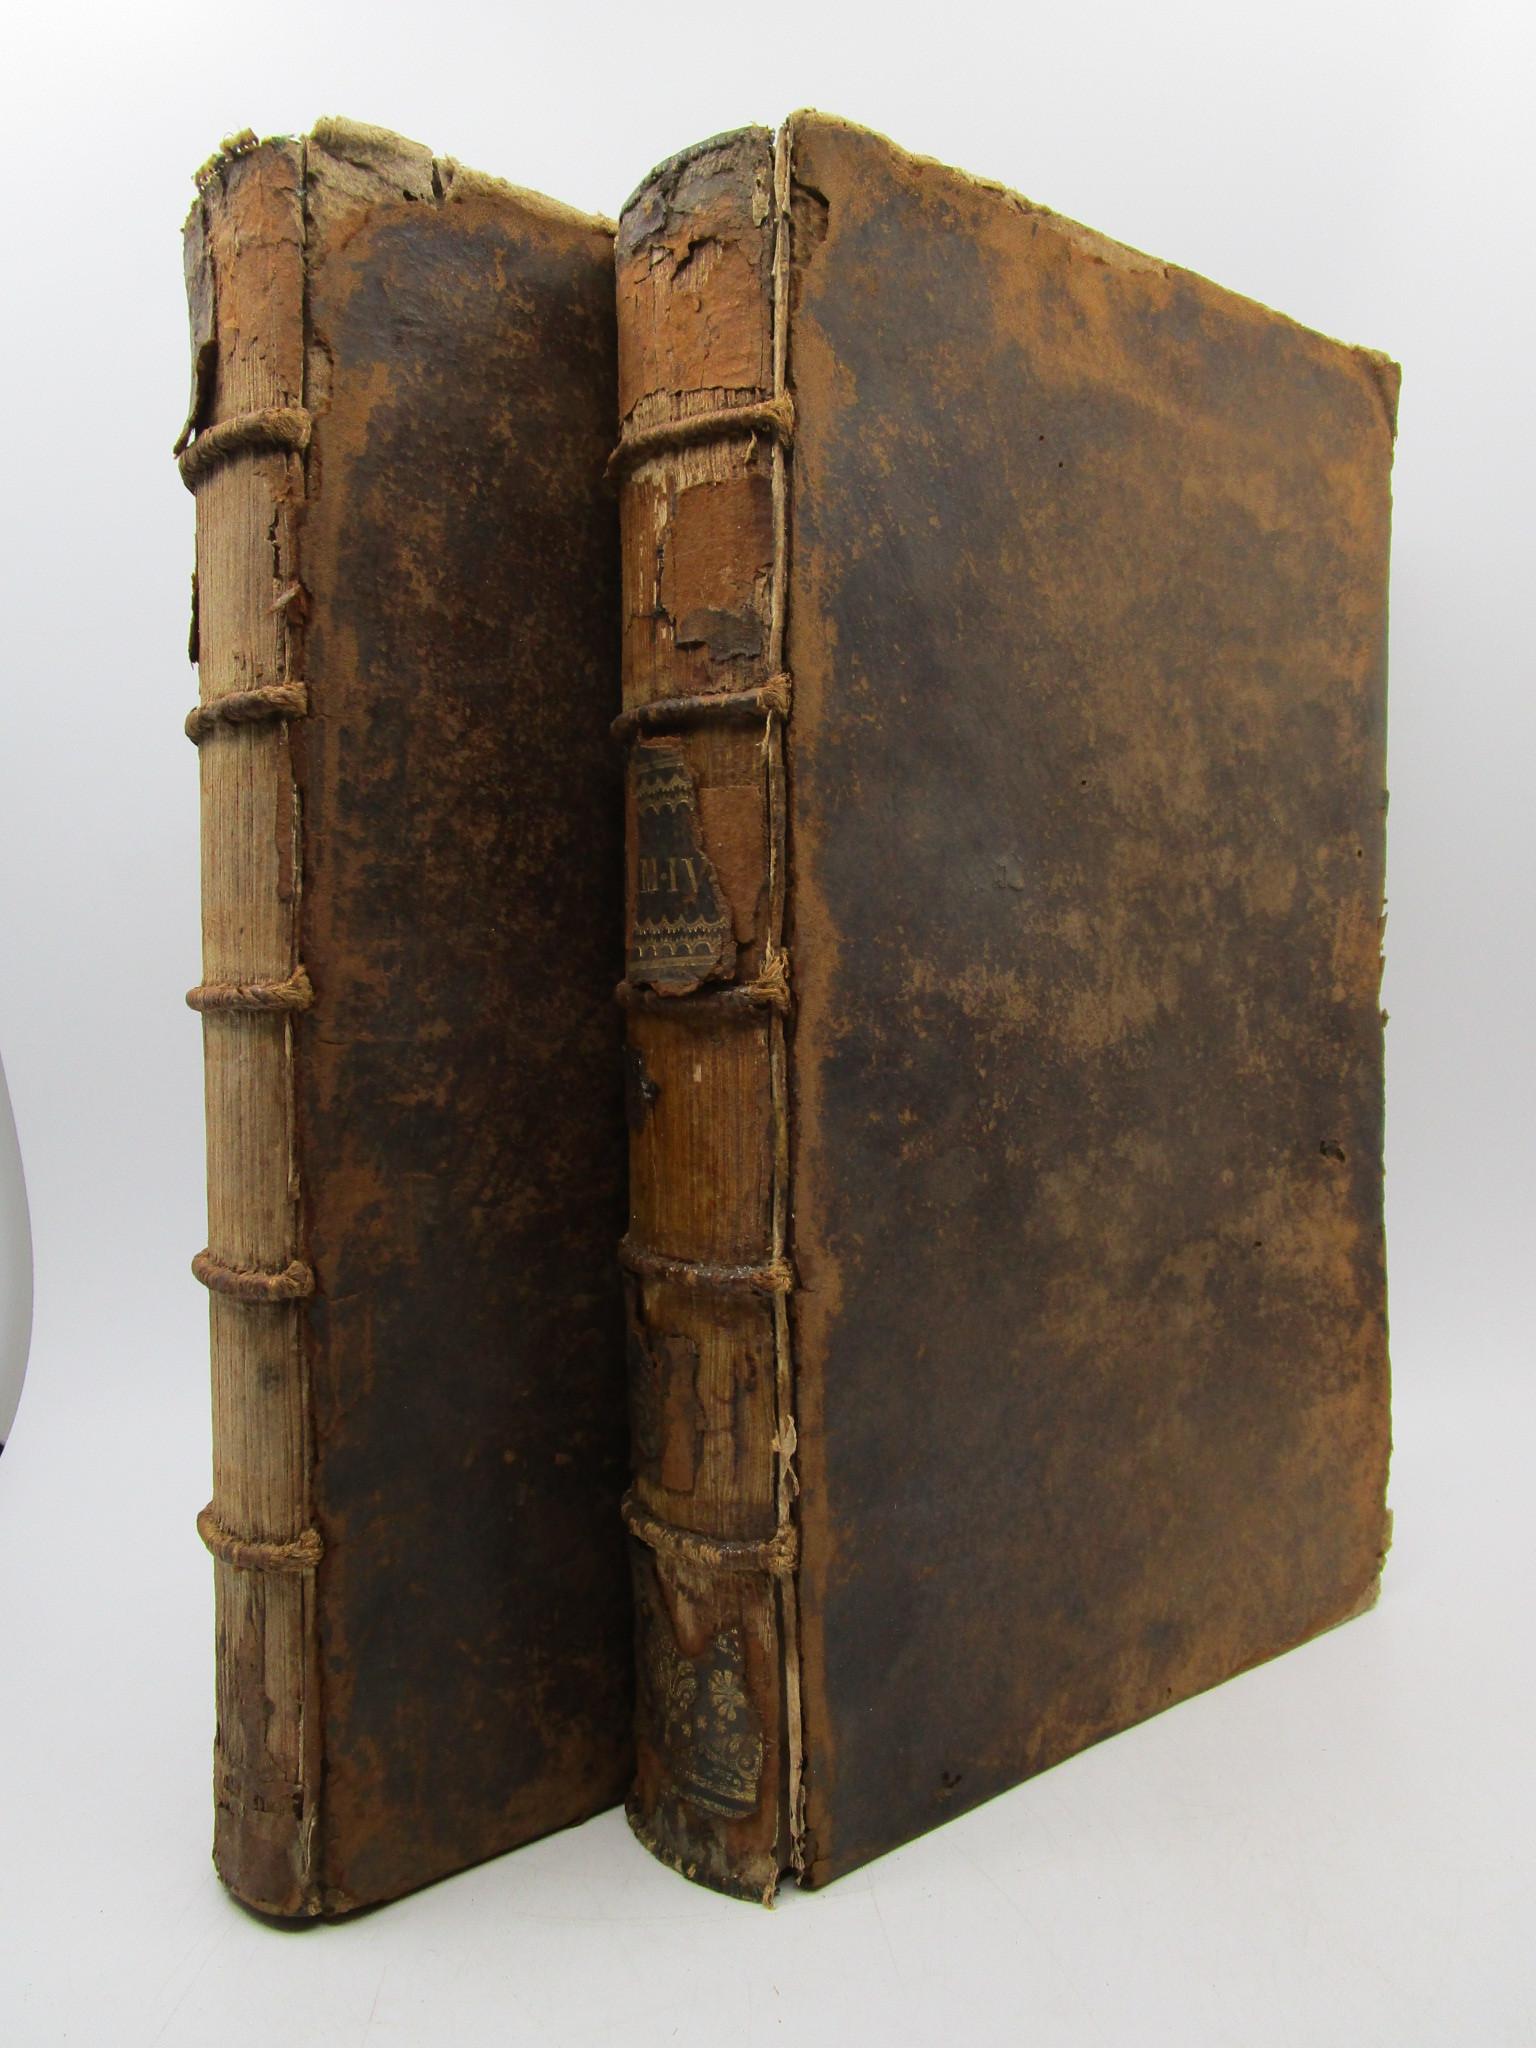 Image for Bibliotheca Concionatoria Ethices Christianae Praecipua Continens Argumenta Ordine Alphabetico Digesta. E Gallico Sermone In Latinum Translata (Volume 4 and 5 Only)